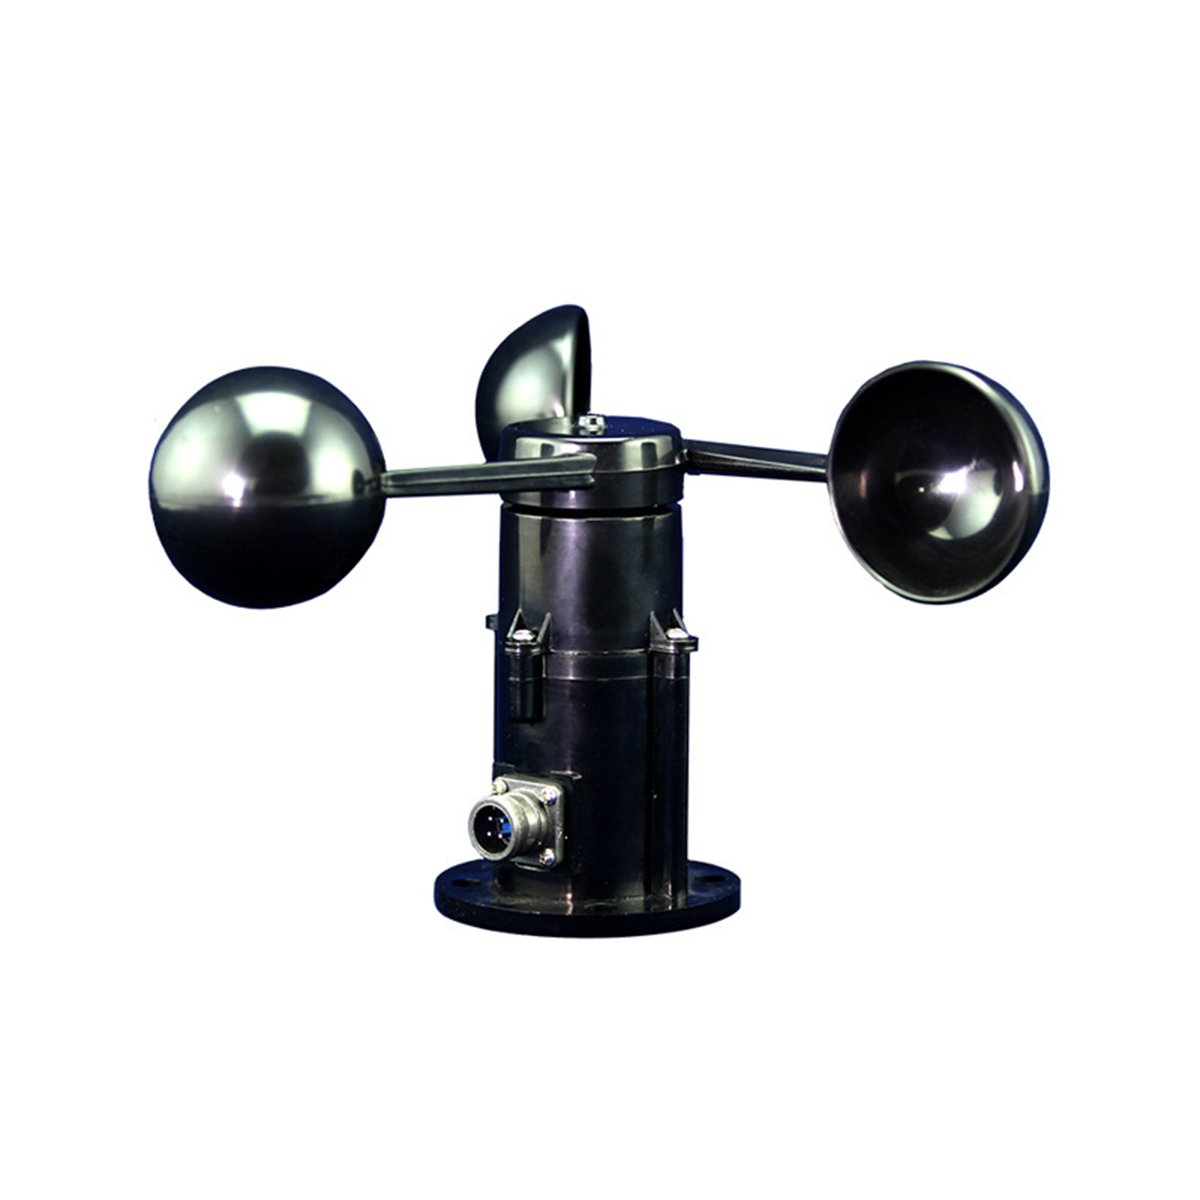 UEETEK Wind speed Sensor Anemometer 0-5V Voltage 3 Cup Wind Speed Transmitter Weather Stations